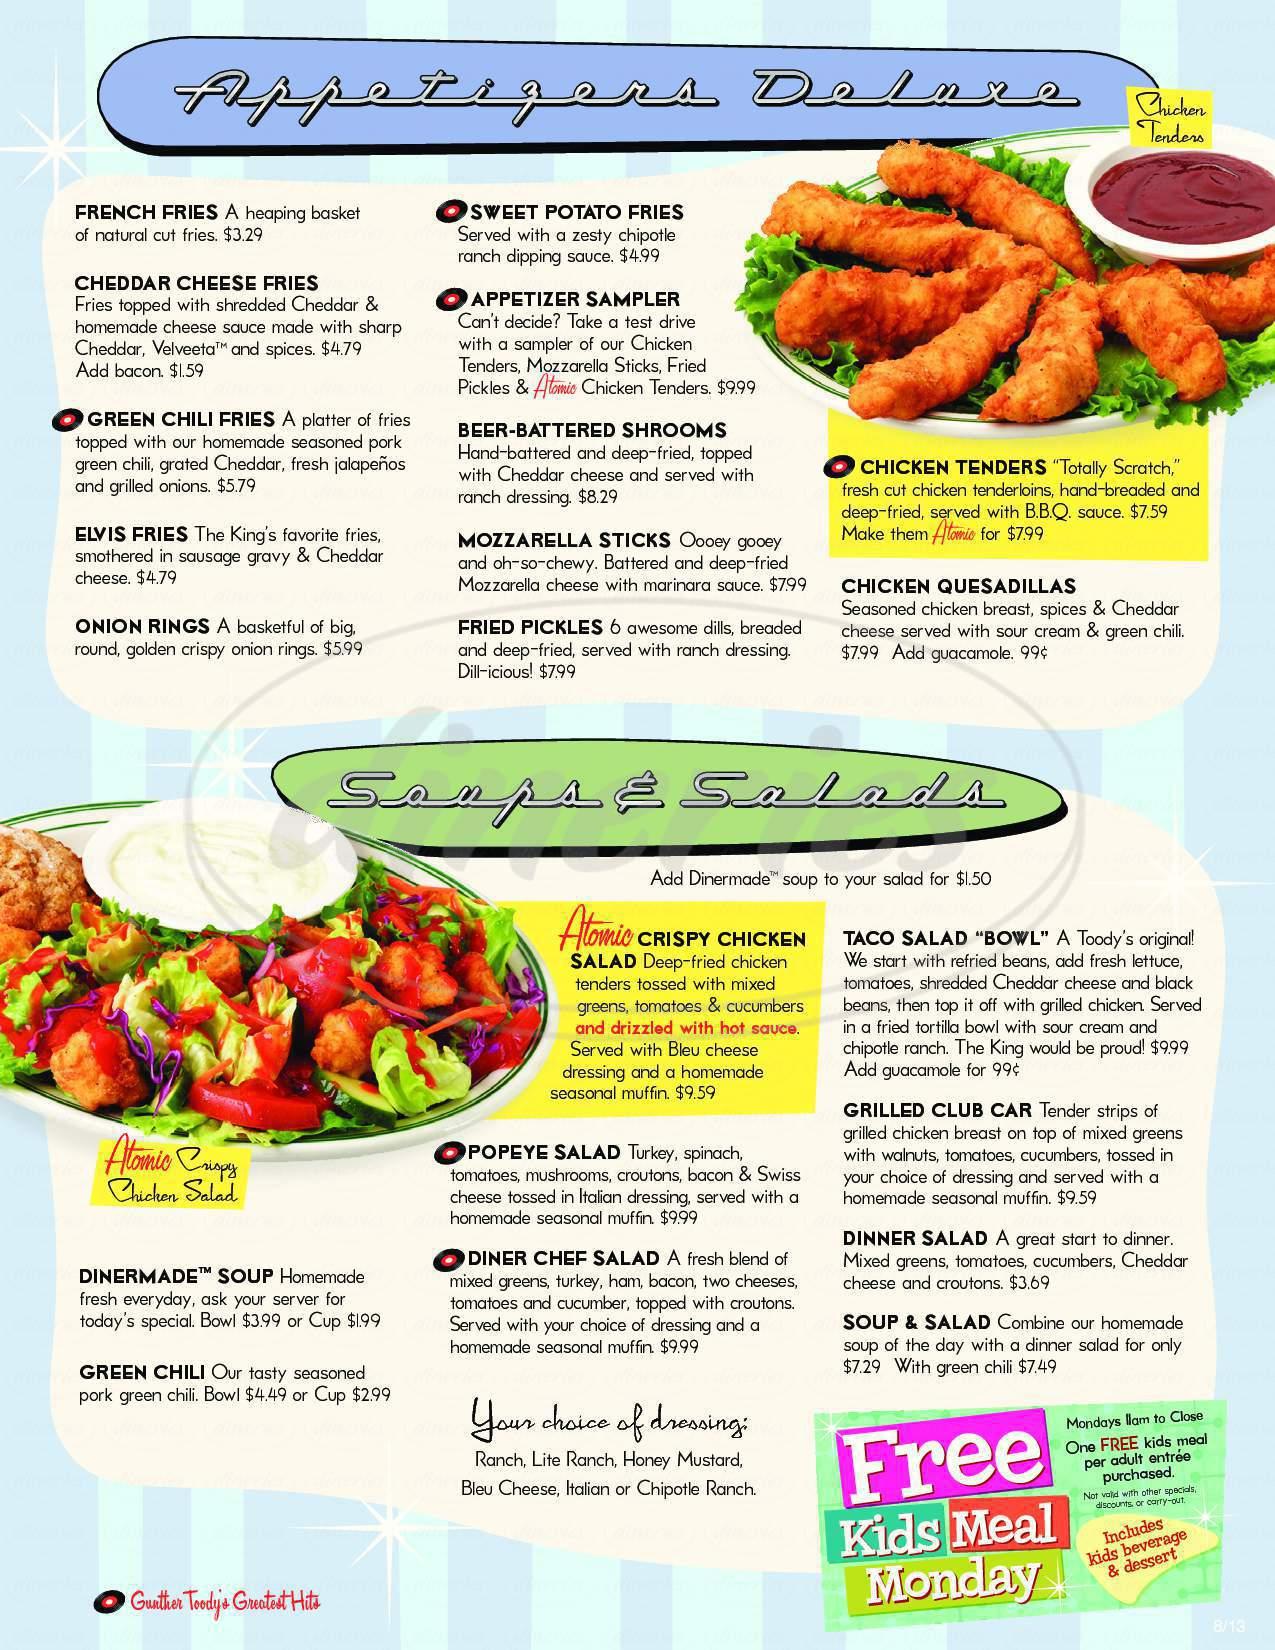 menu for Gunther Toody's Diner